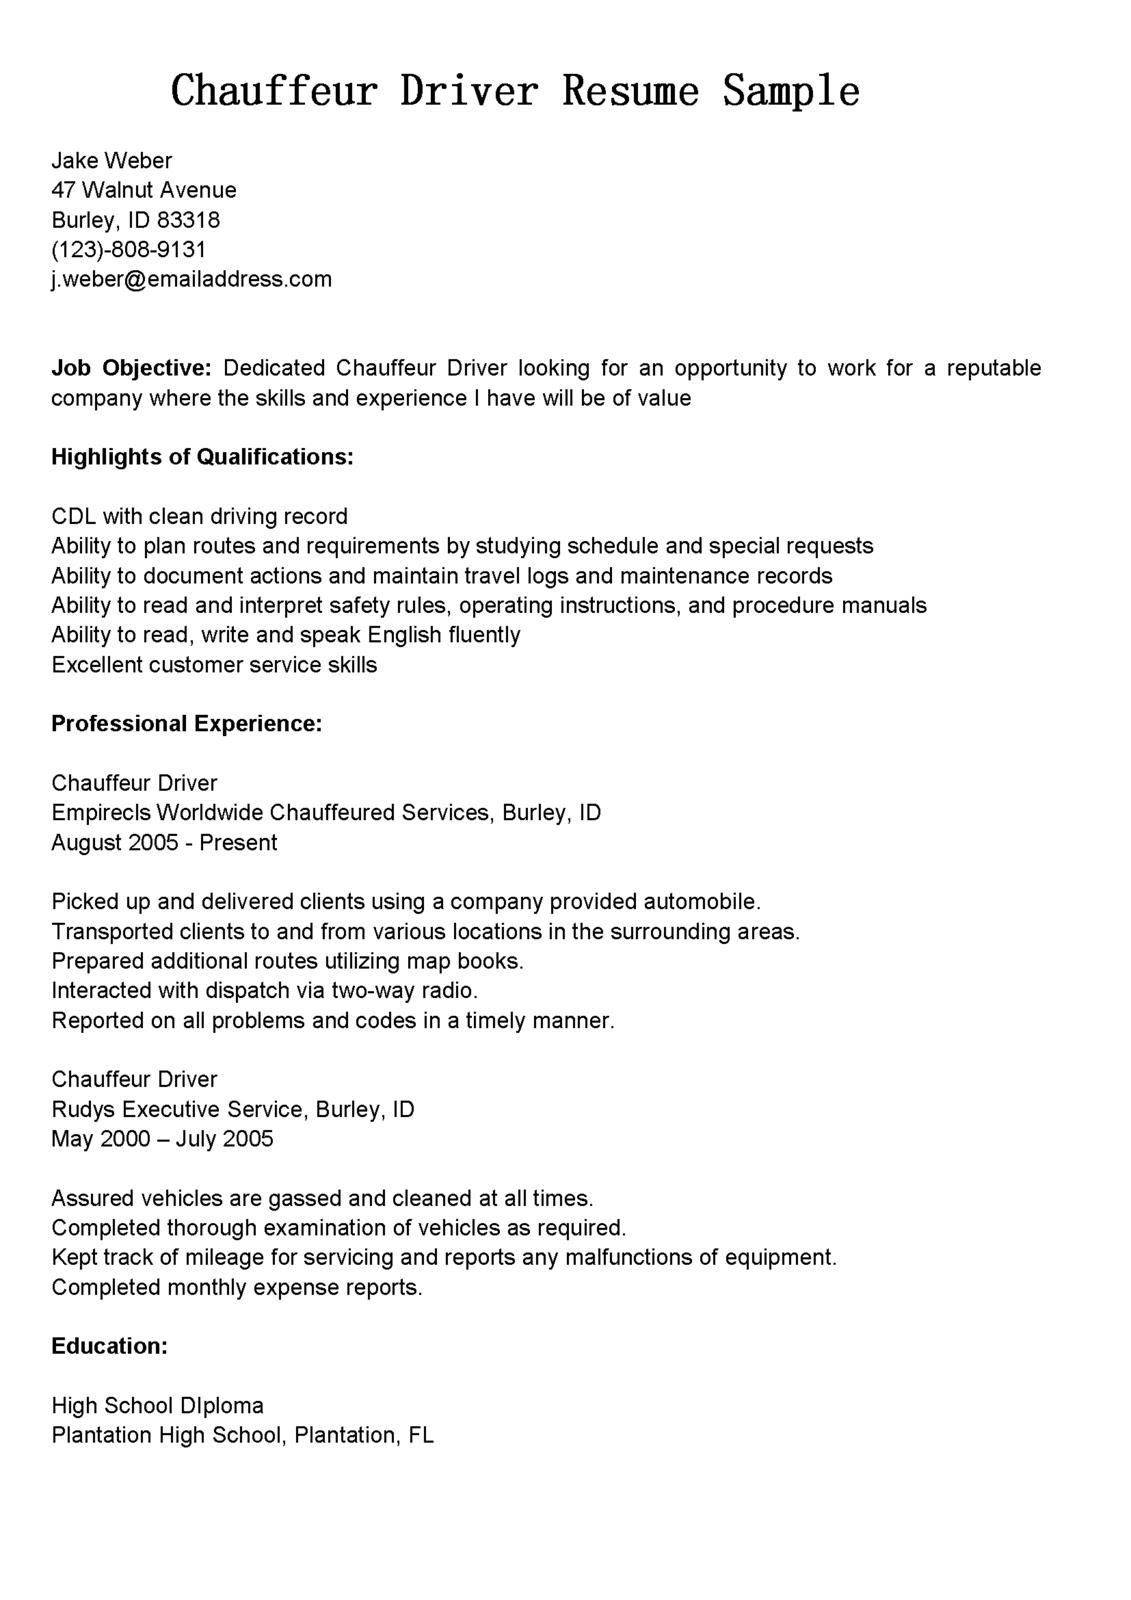 resume car driver resume samples flatbed truck driver resume